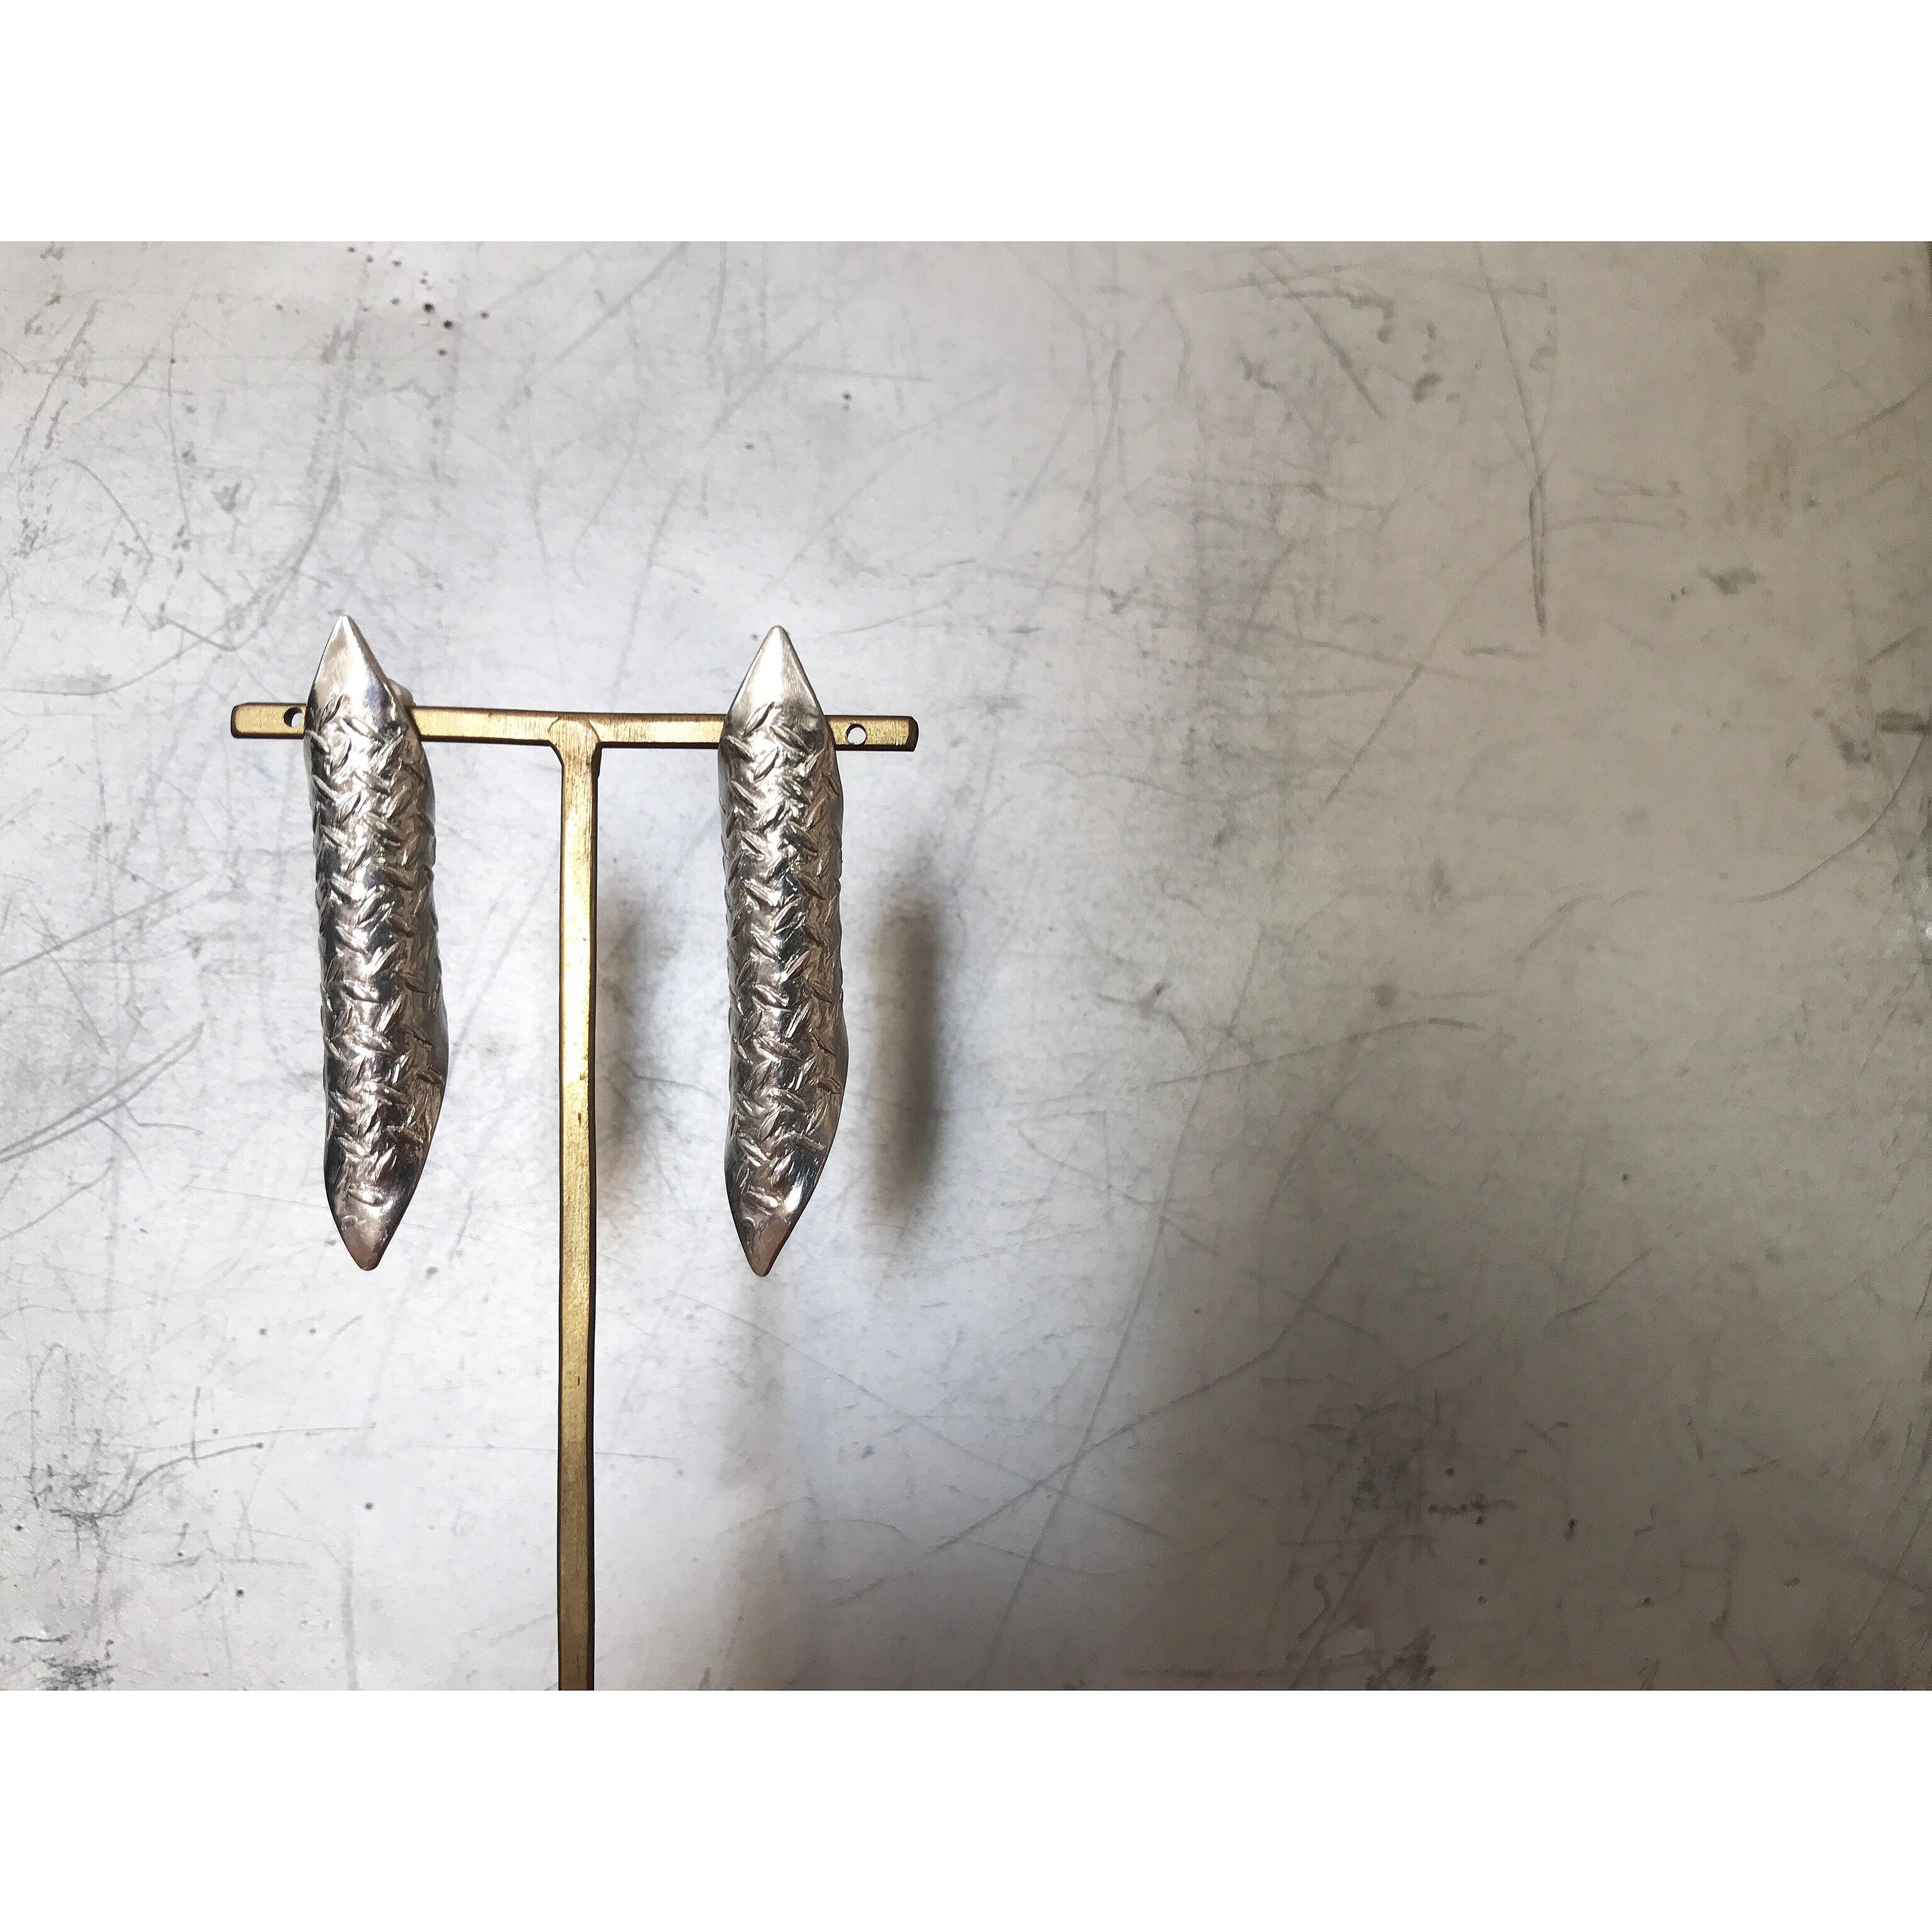 SV/k18_【Brooklyn】earring (order)